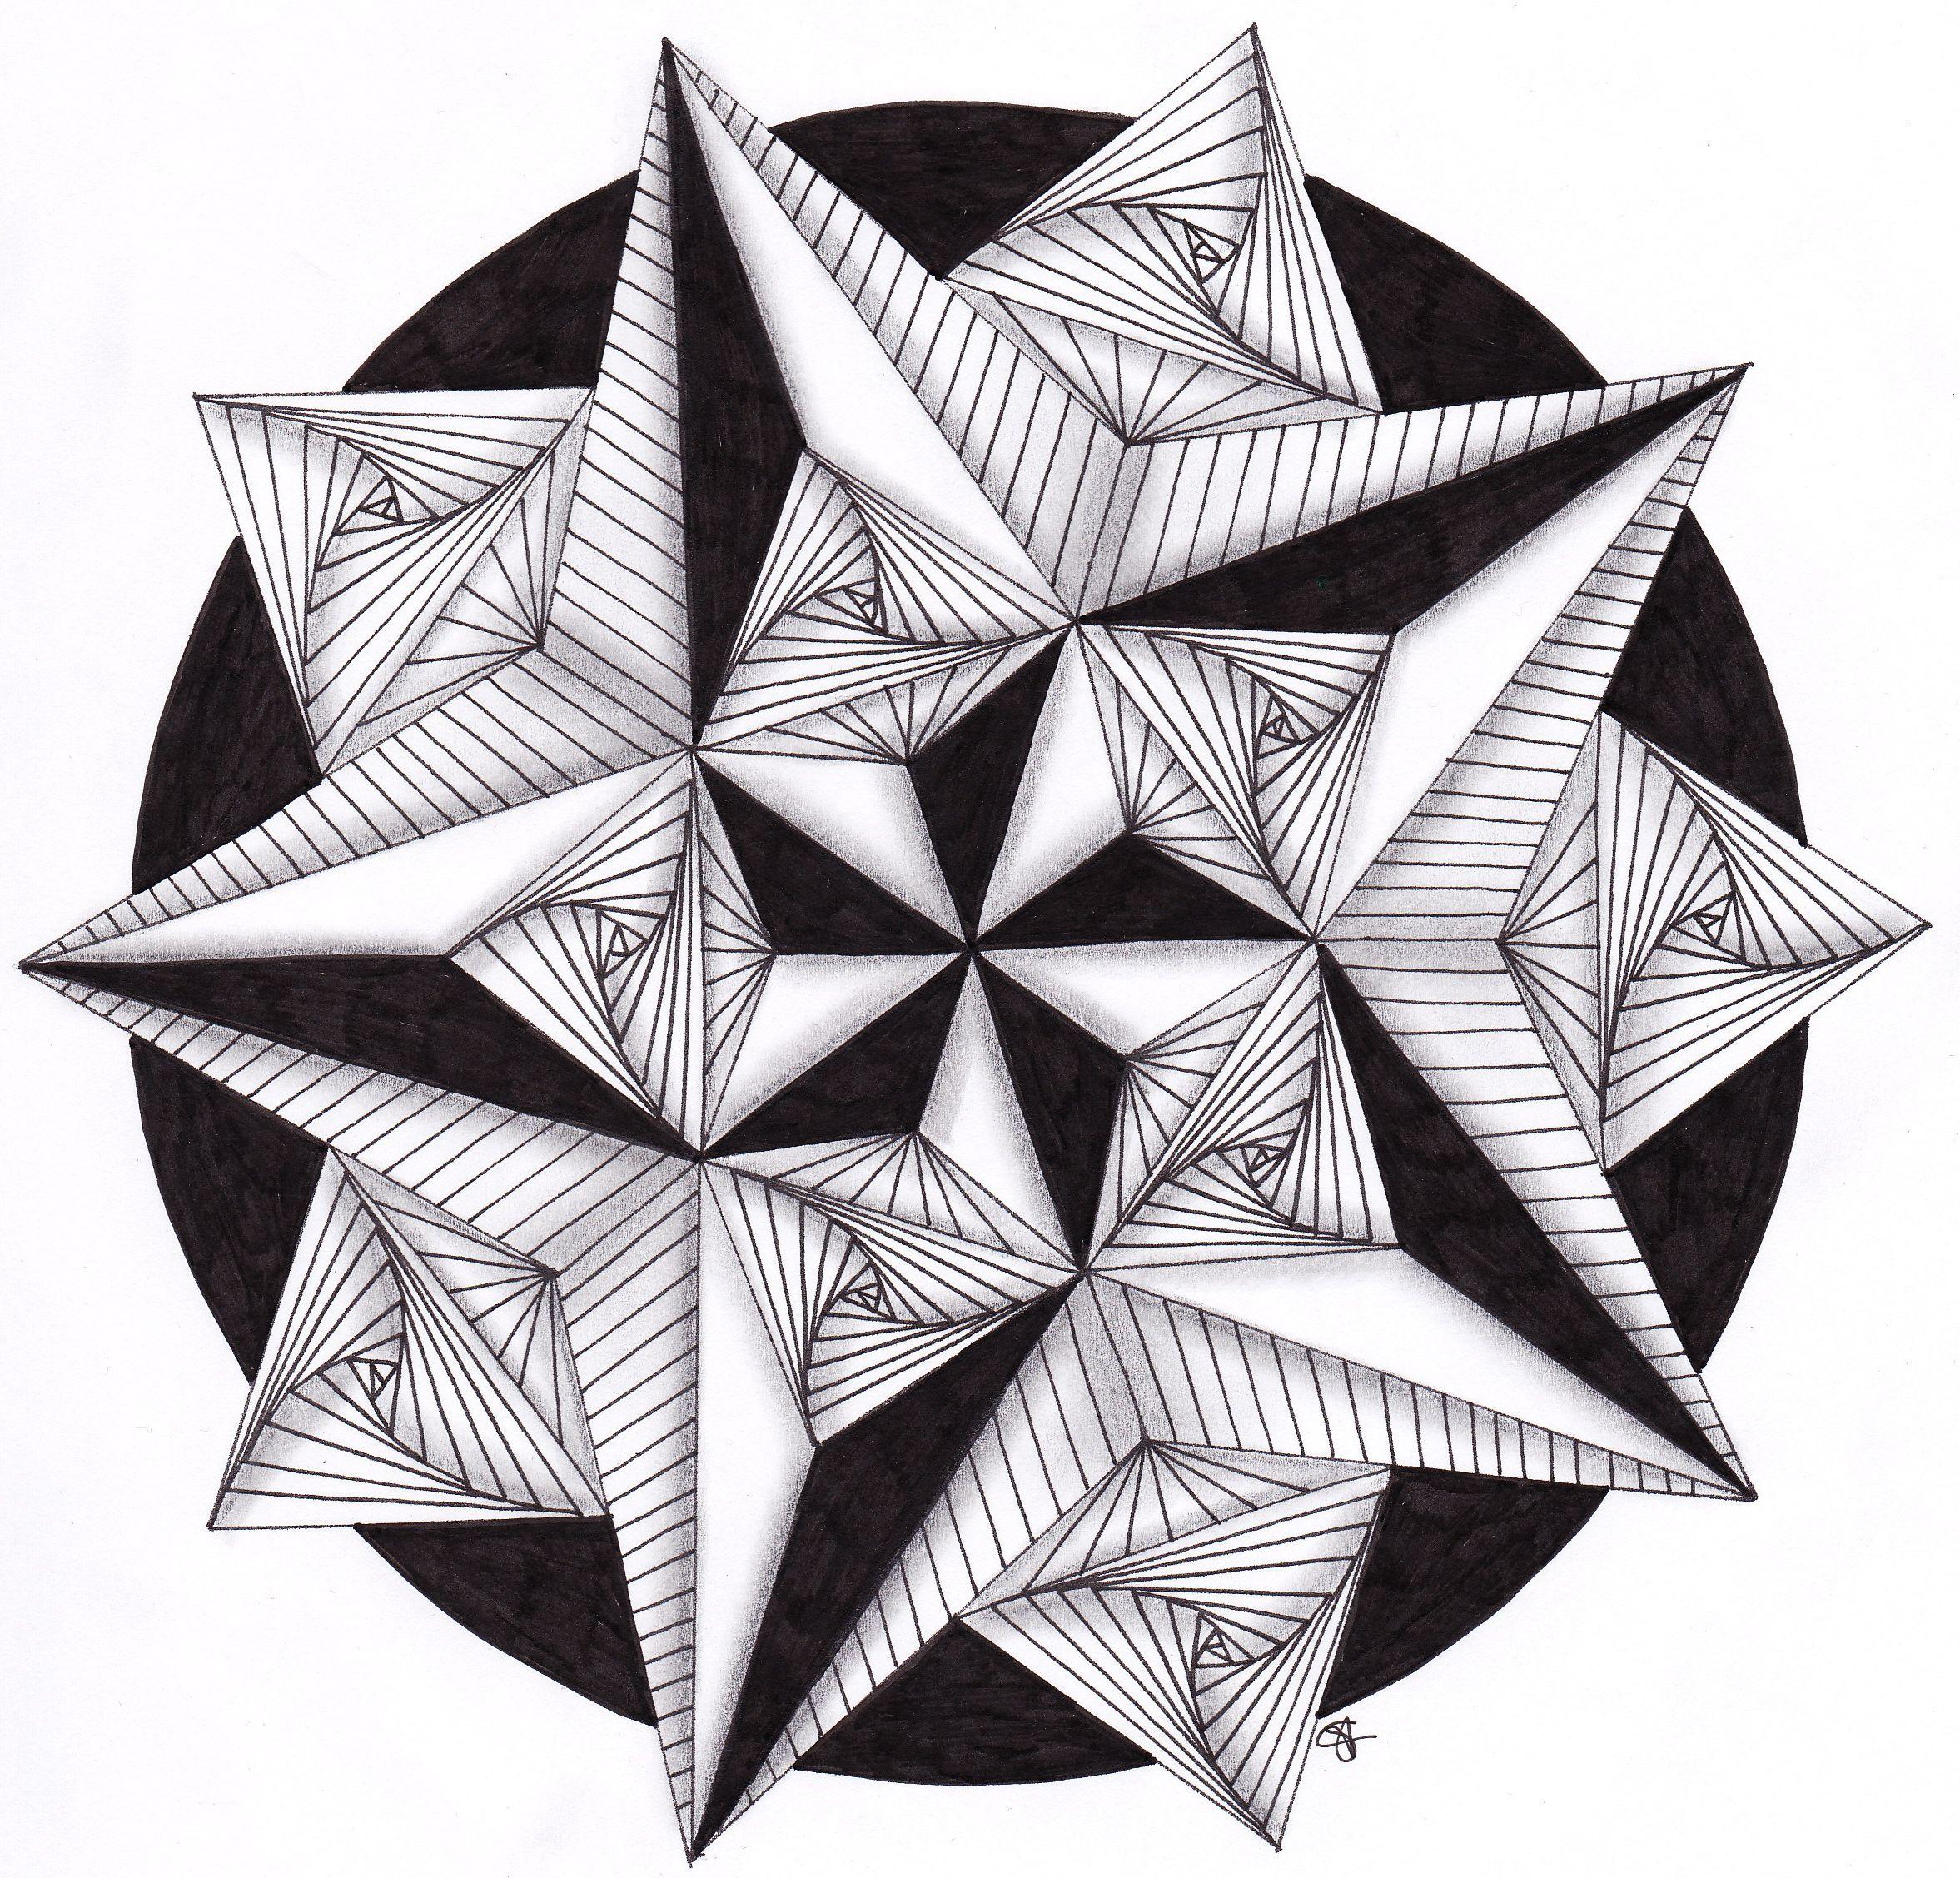 Hand Drawn Mandala Star Filled With Zentangle Patterns Zentangle Patronen Mandala Kleurplaten Tekentechnieken